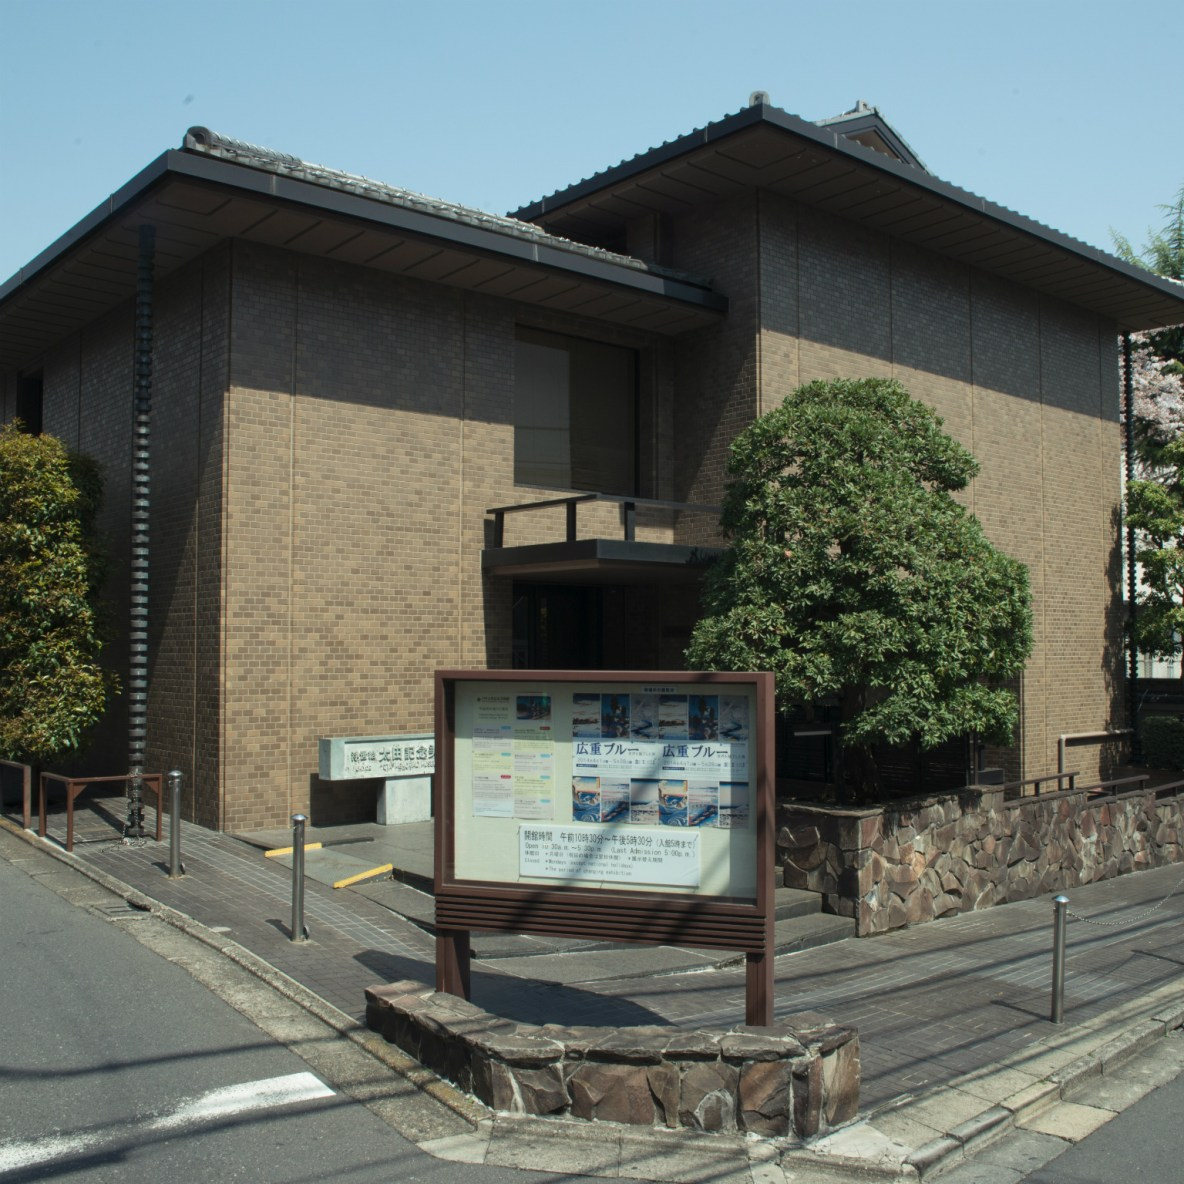 Michi Akagi